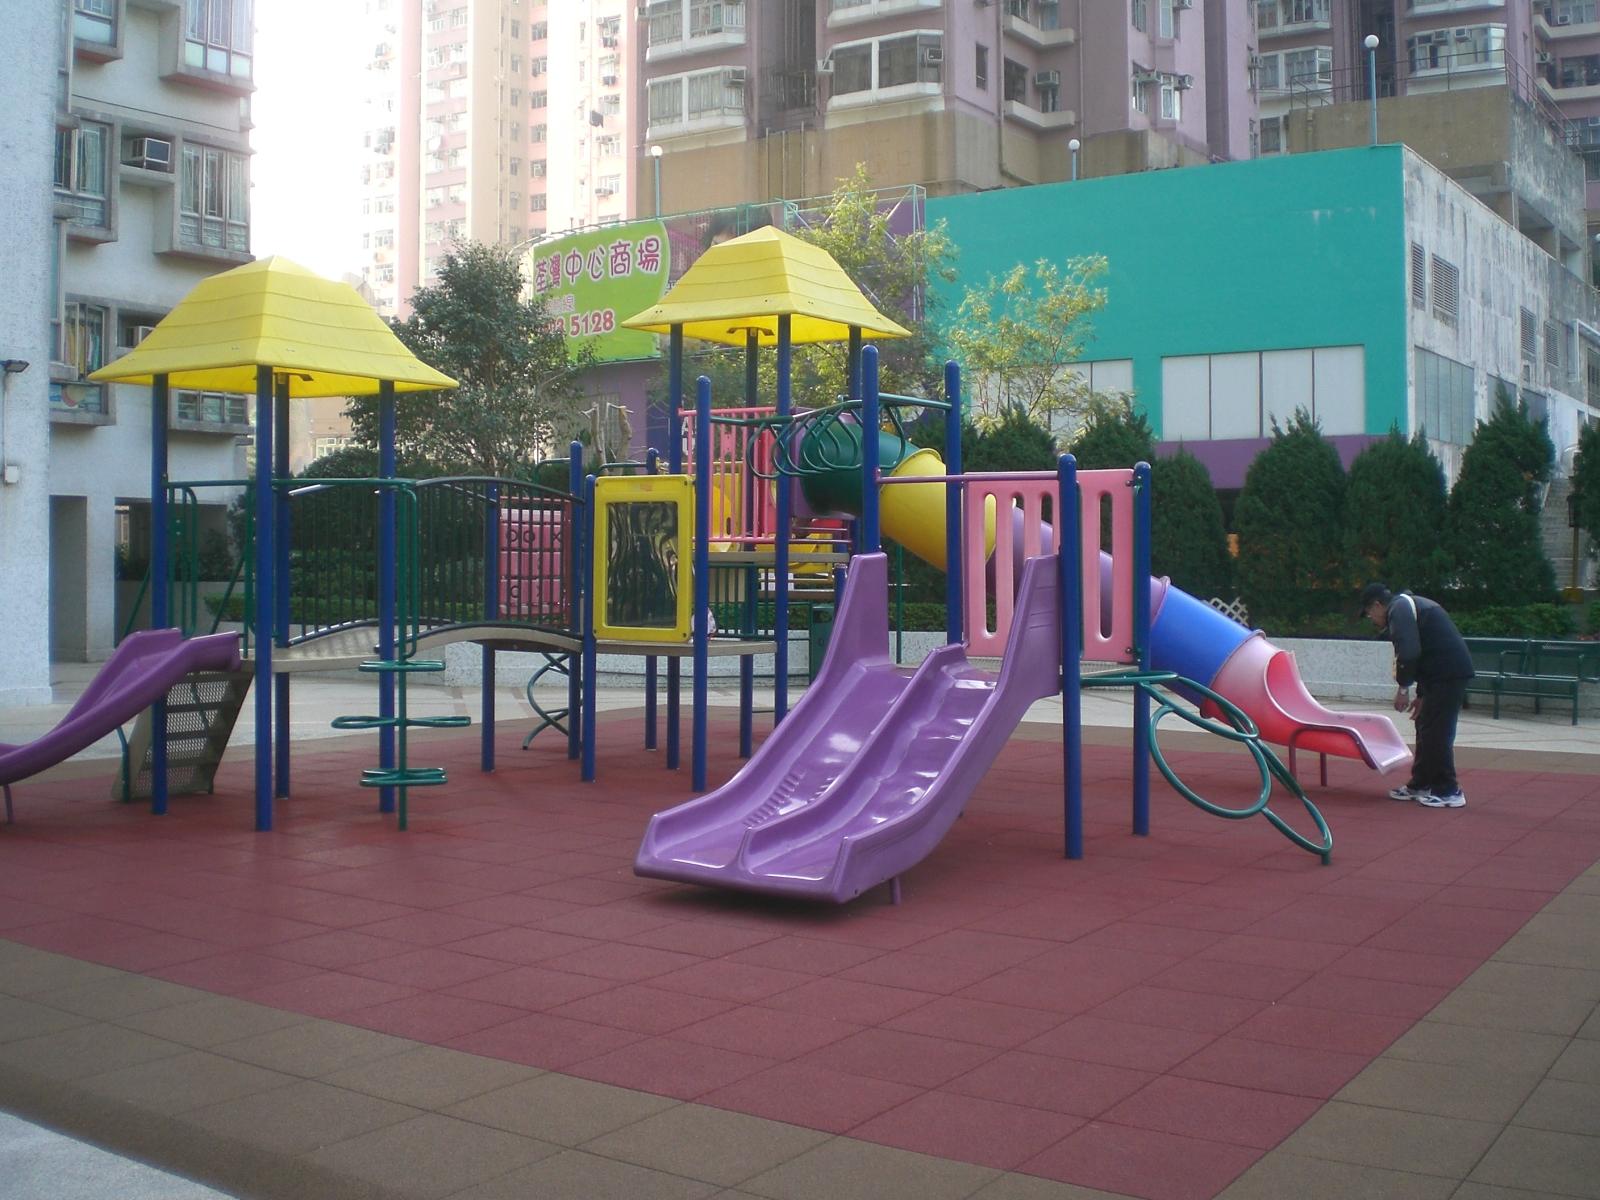 File:HK Tsuen Wan Tsuen King Garden Podium Playground Slides.JPG - 維基百科,自由嘅百科全書